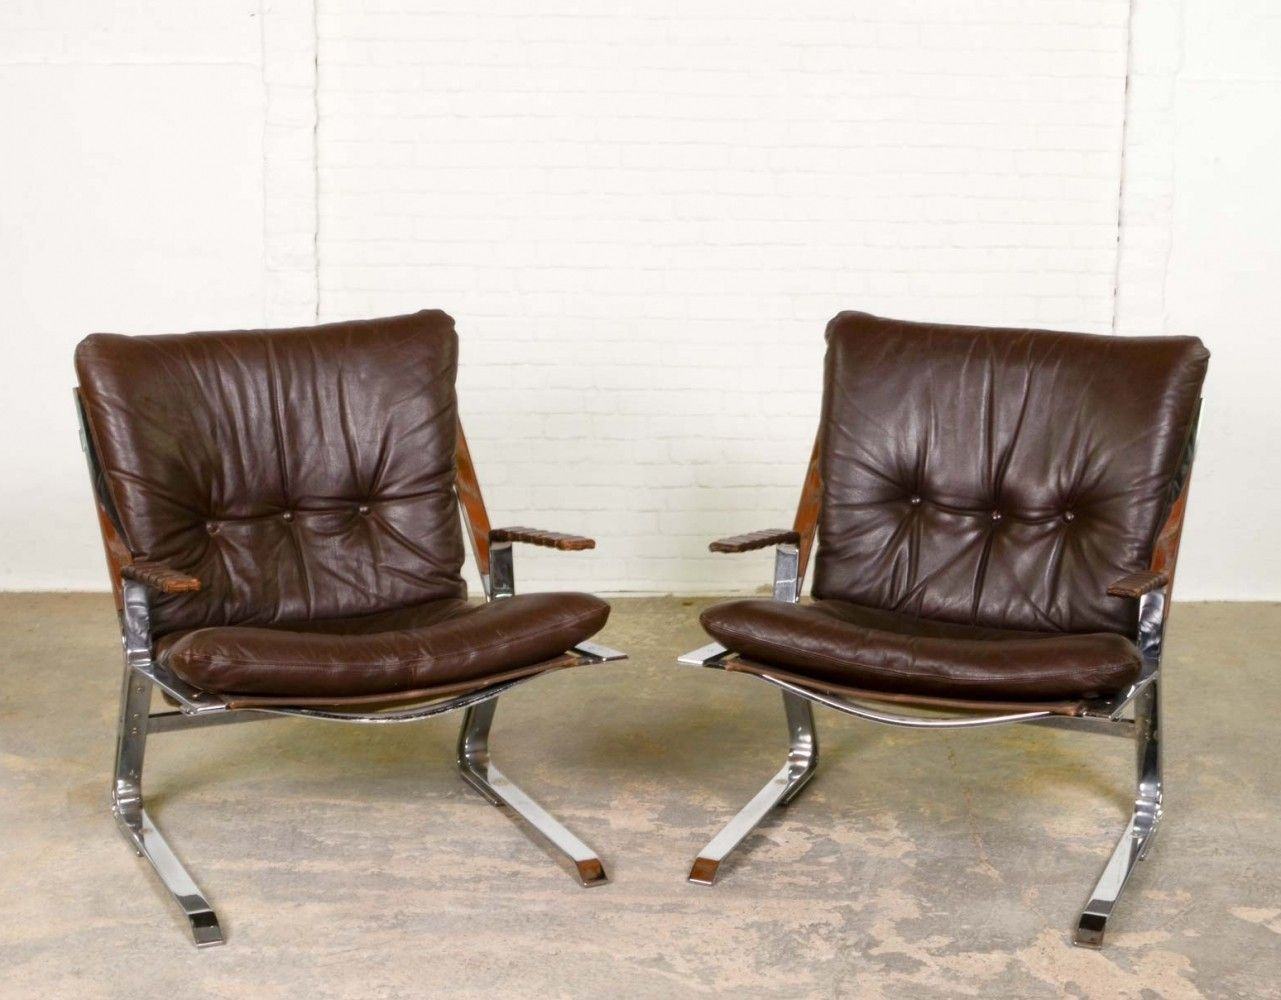 Molinari Sedie ~ Molinari foldable easy chairs designed by teun van zanten